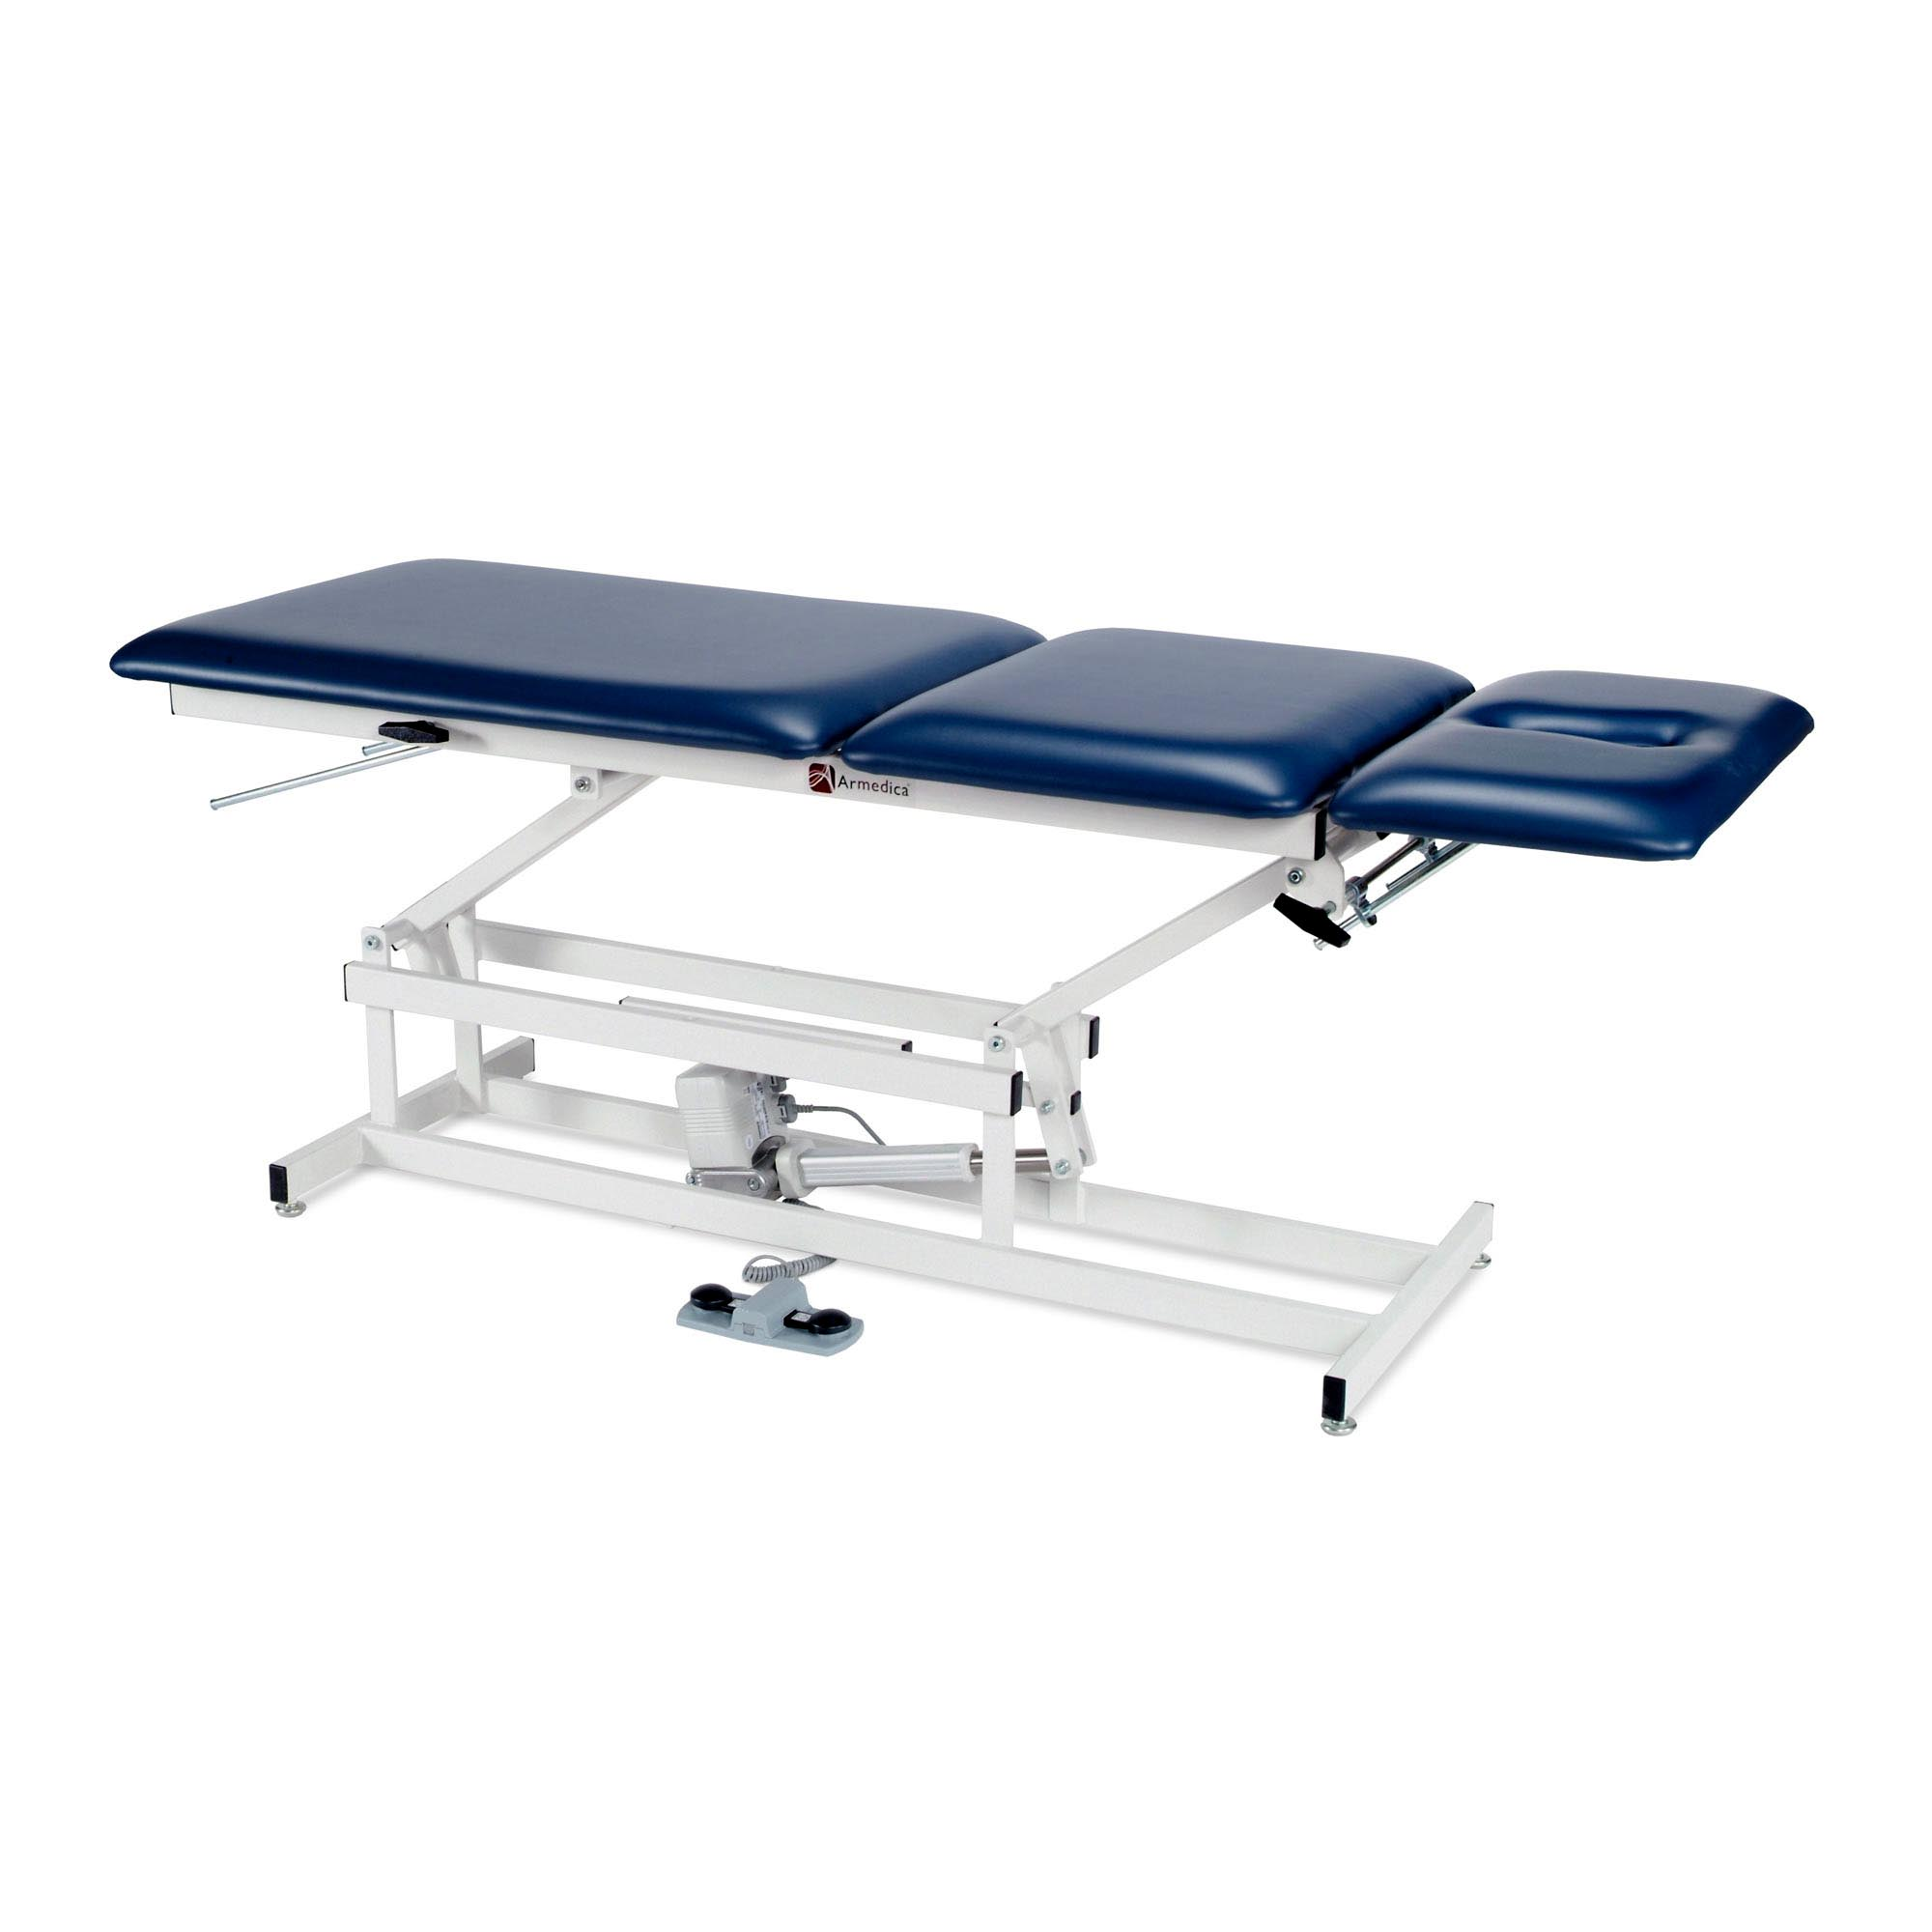 Armedica AM-353 treatment table